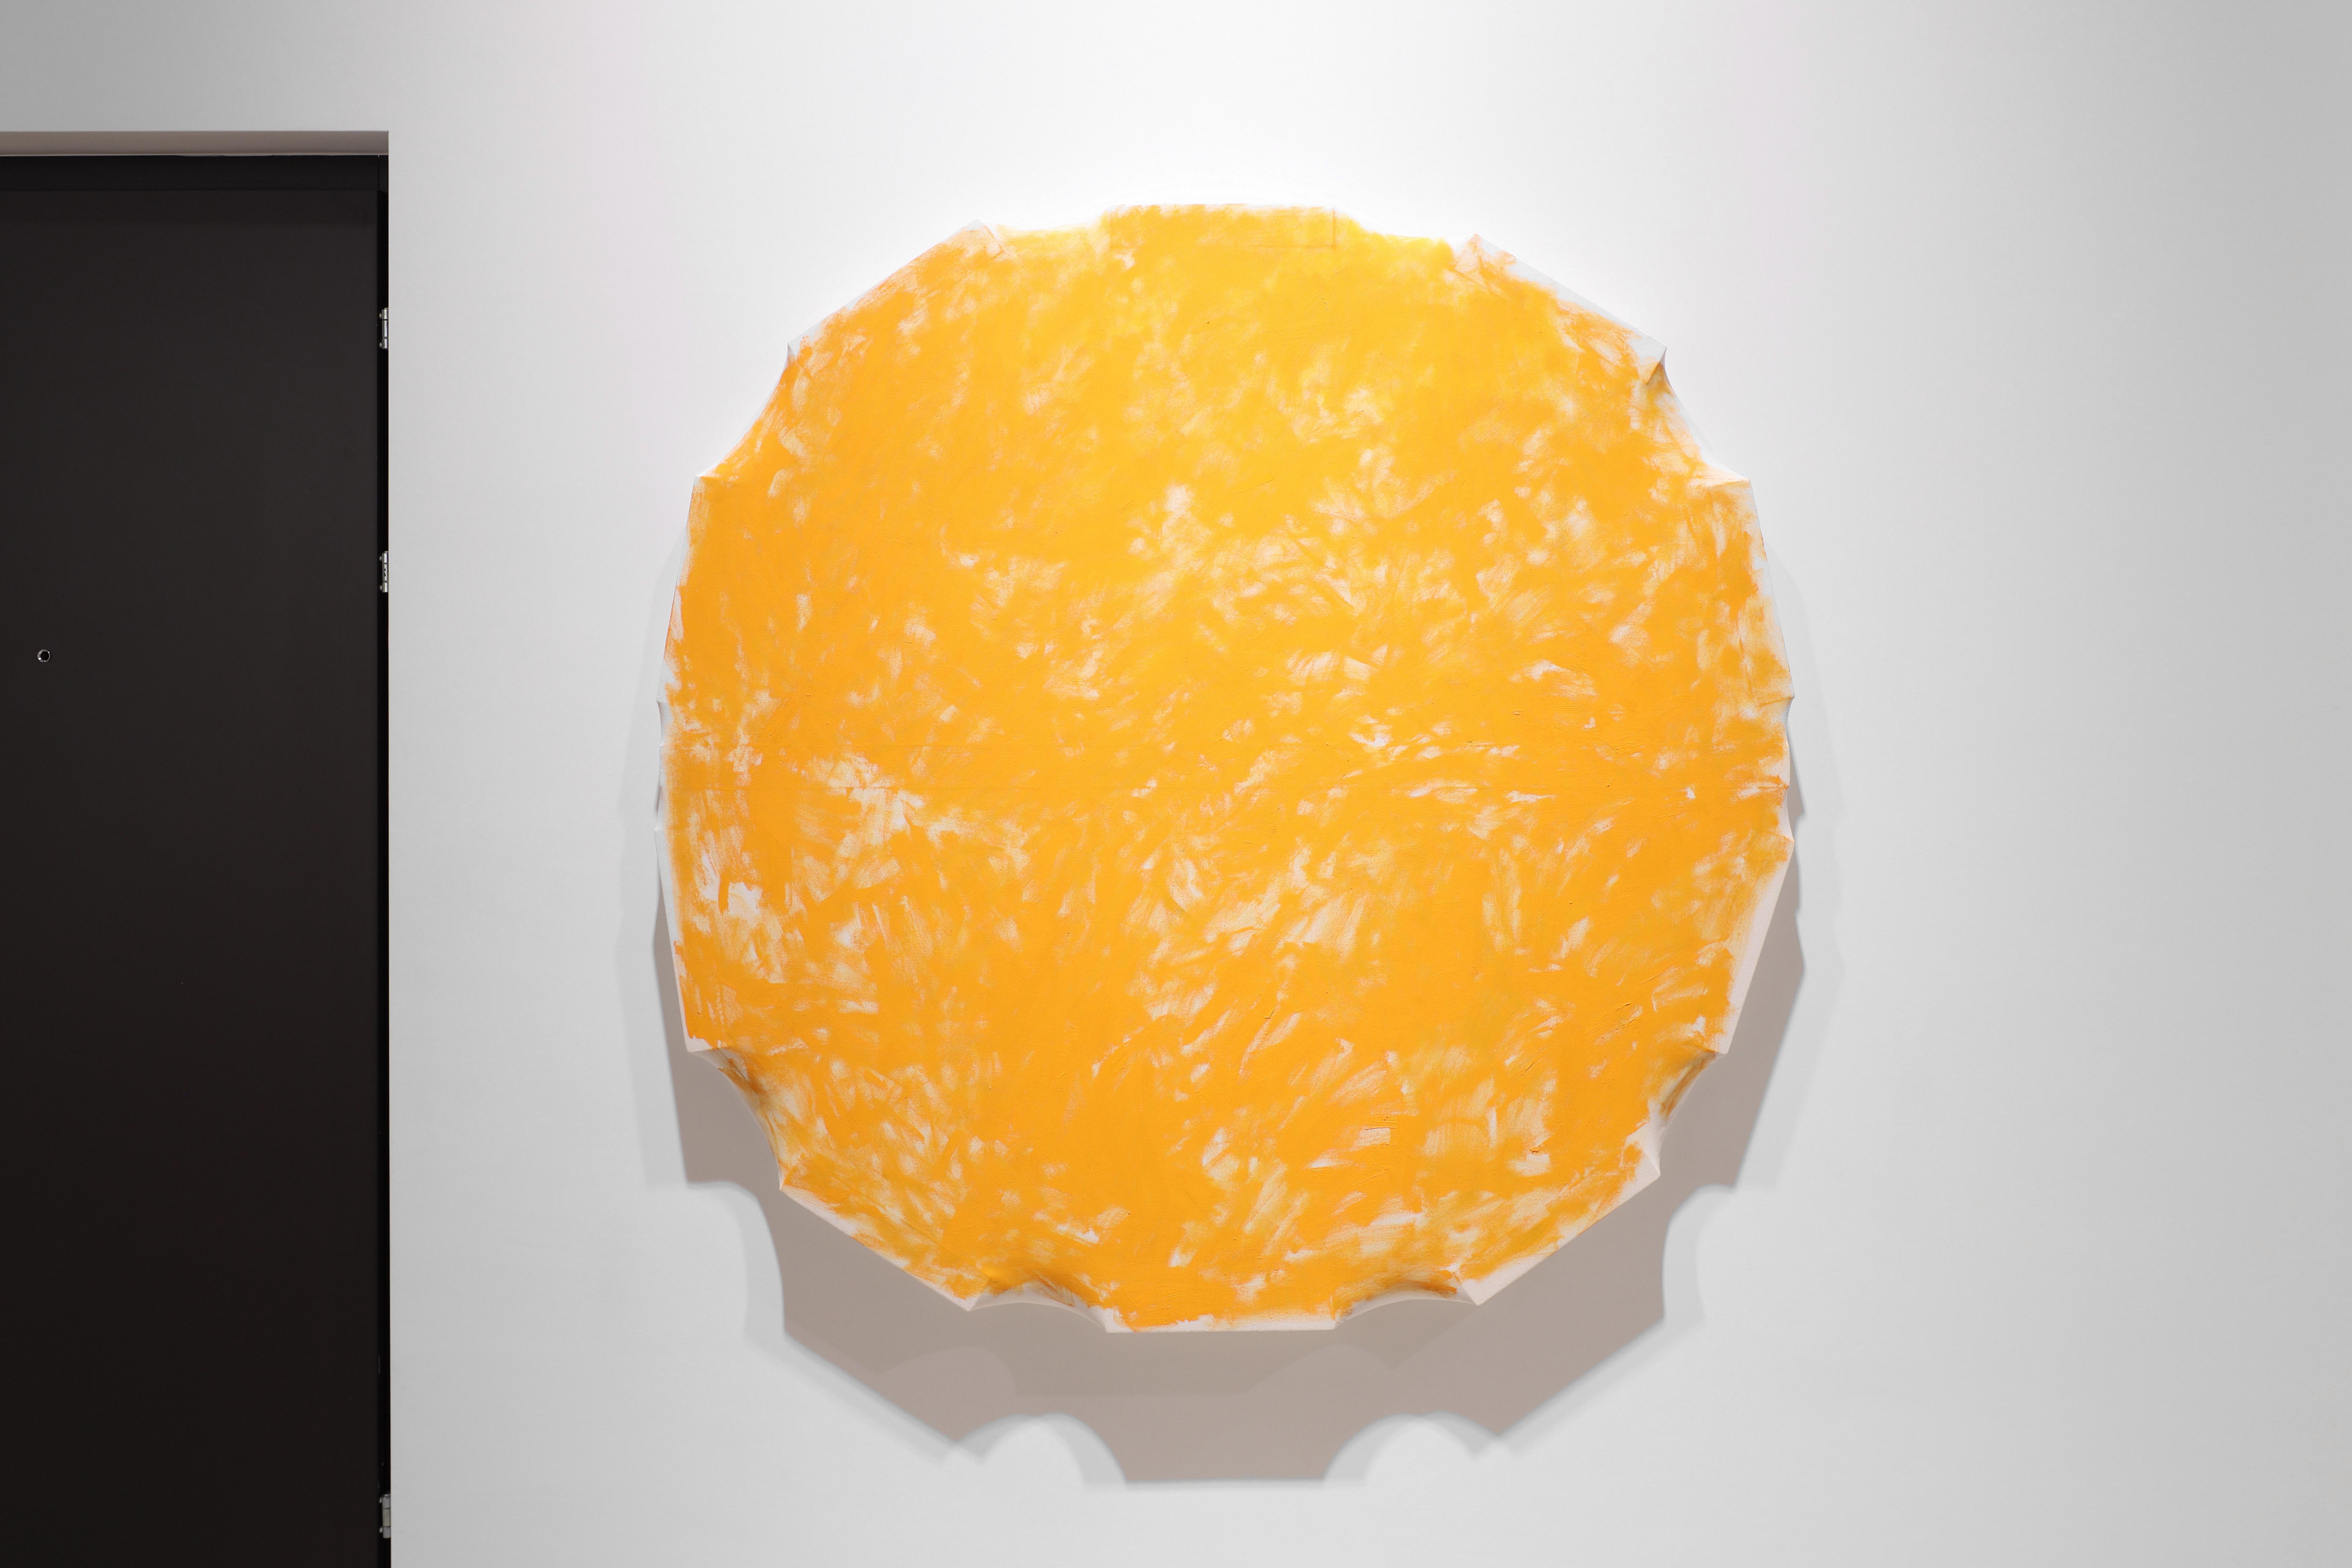 Charles Benjamin, Solesito, 2020, oil on canvas, 150 x 150 x 10cm